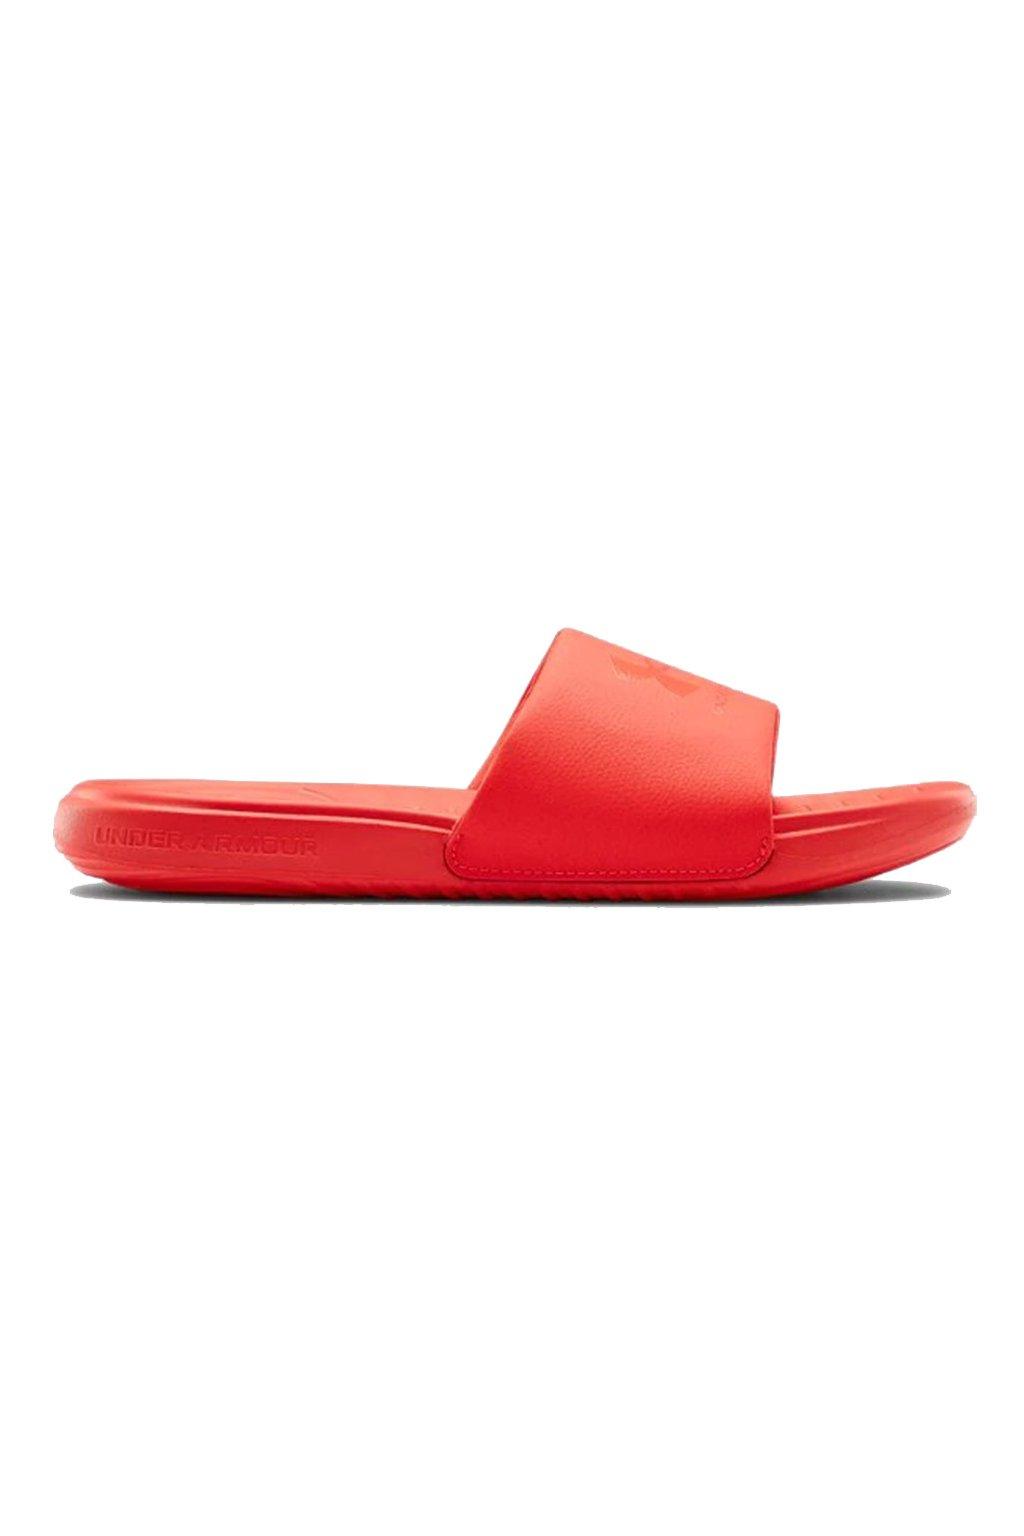 Pánske papuče Under Armour Ansa Fix Sl červené 3023761 602